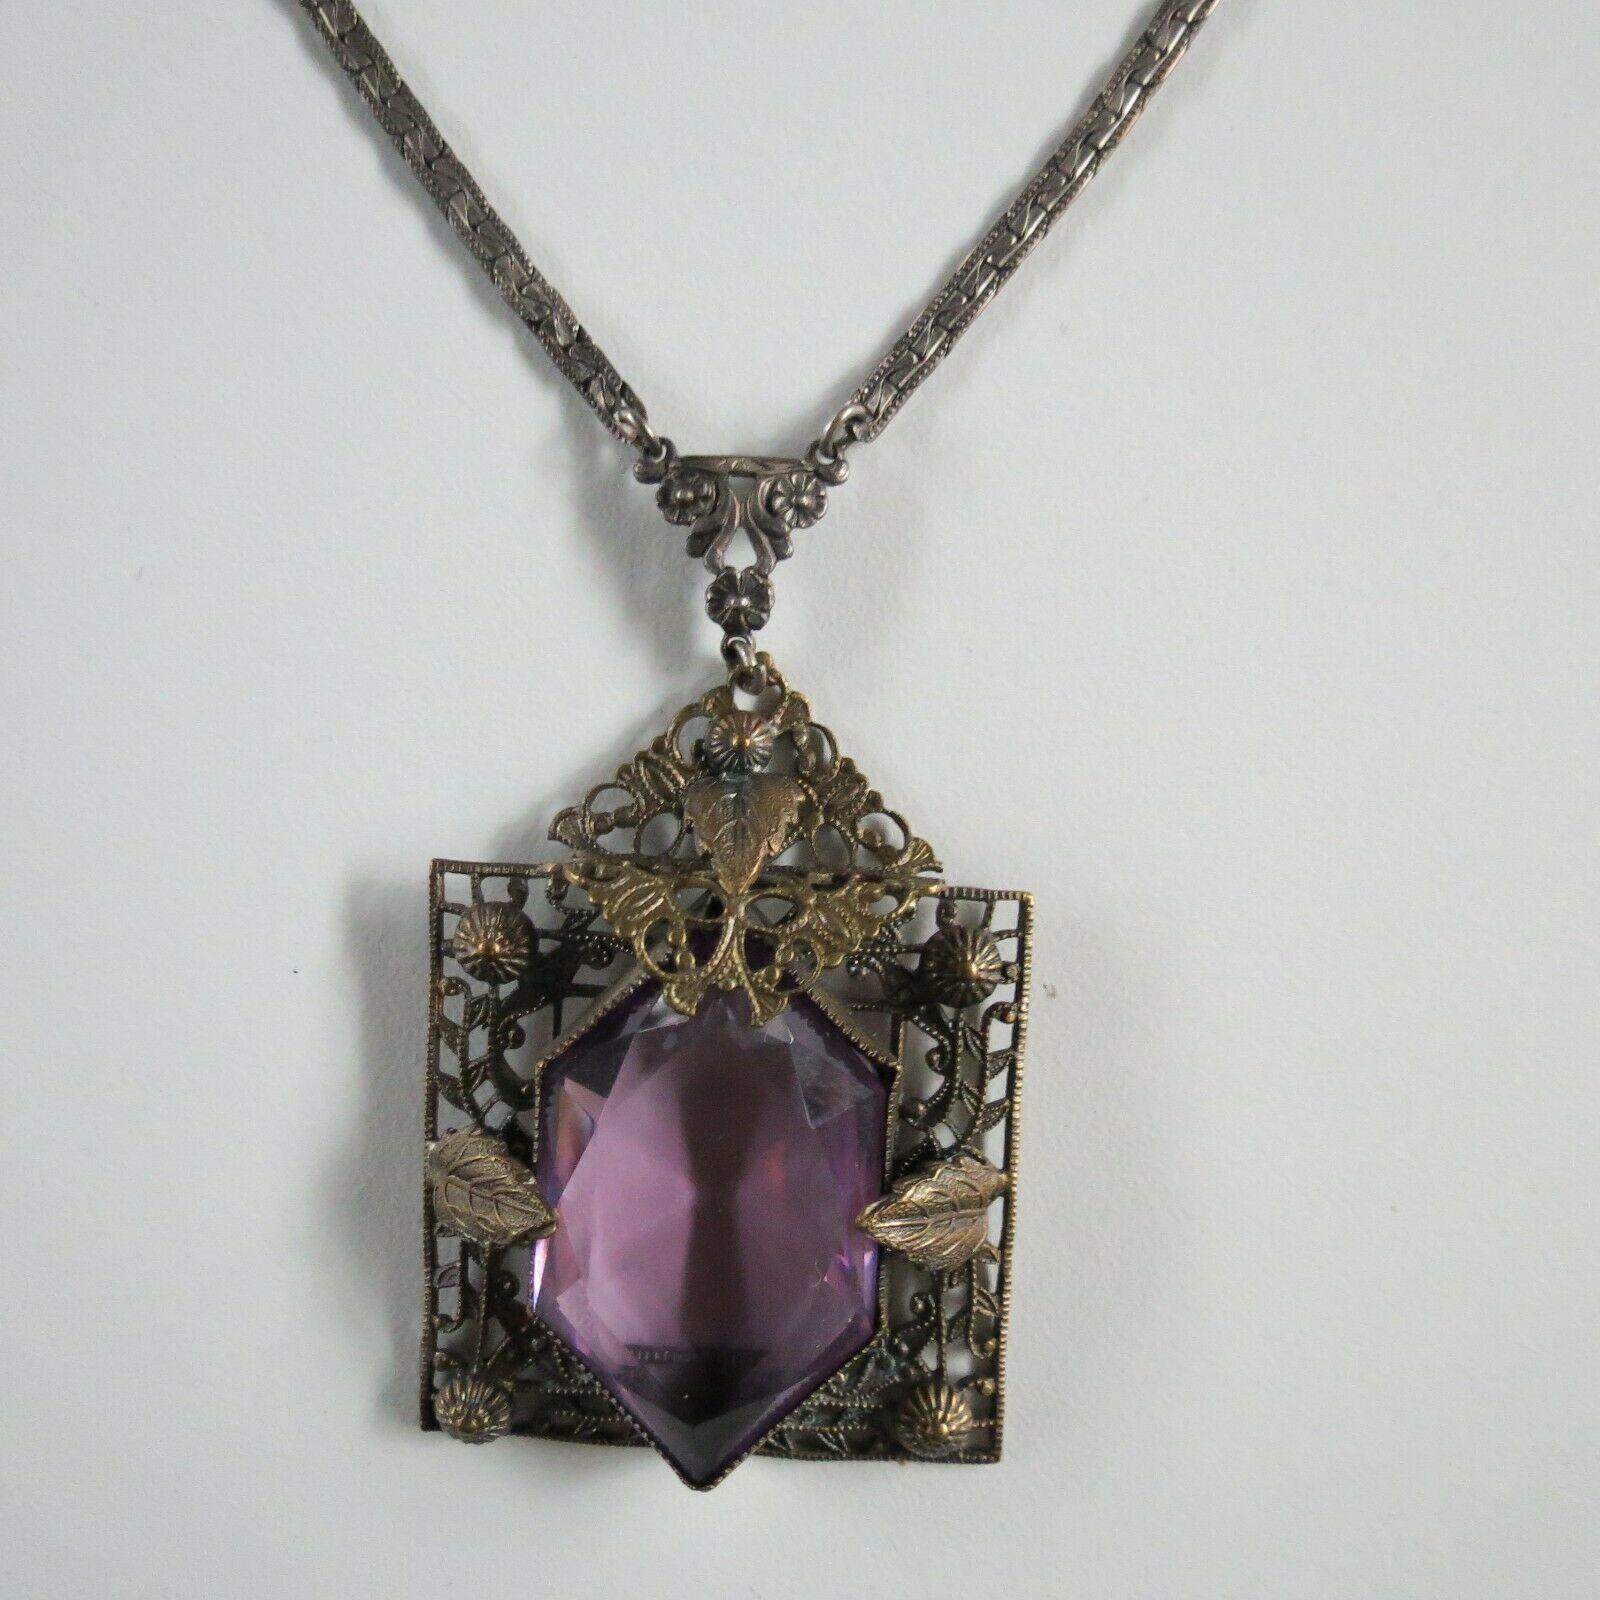 Antique Neiger Eduardian Purple bronze amethyst glass necklace Czech 18in 1900